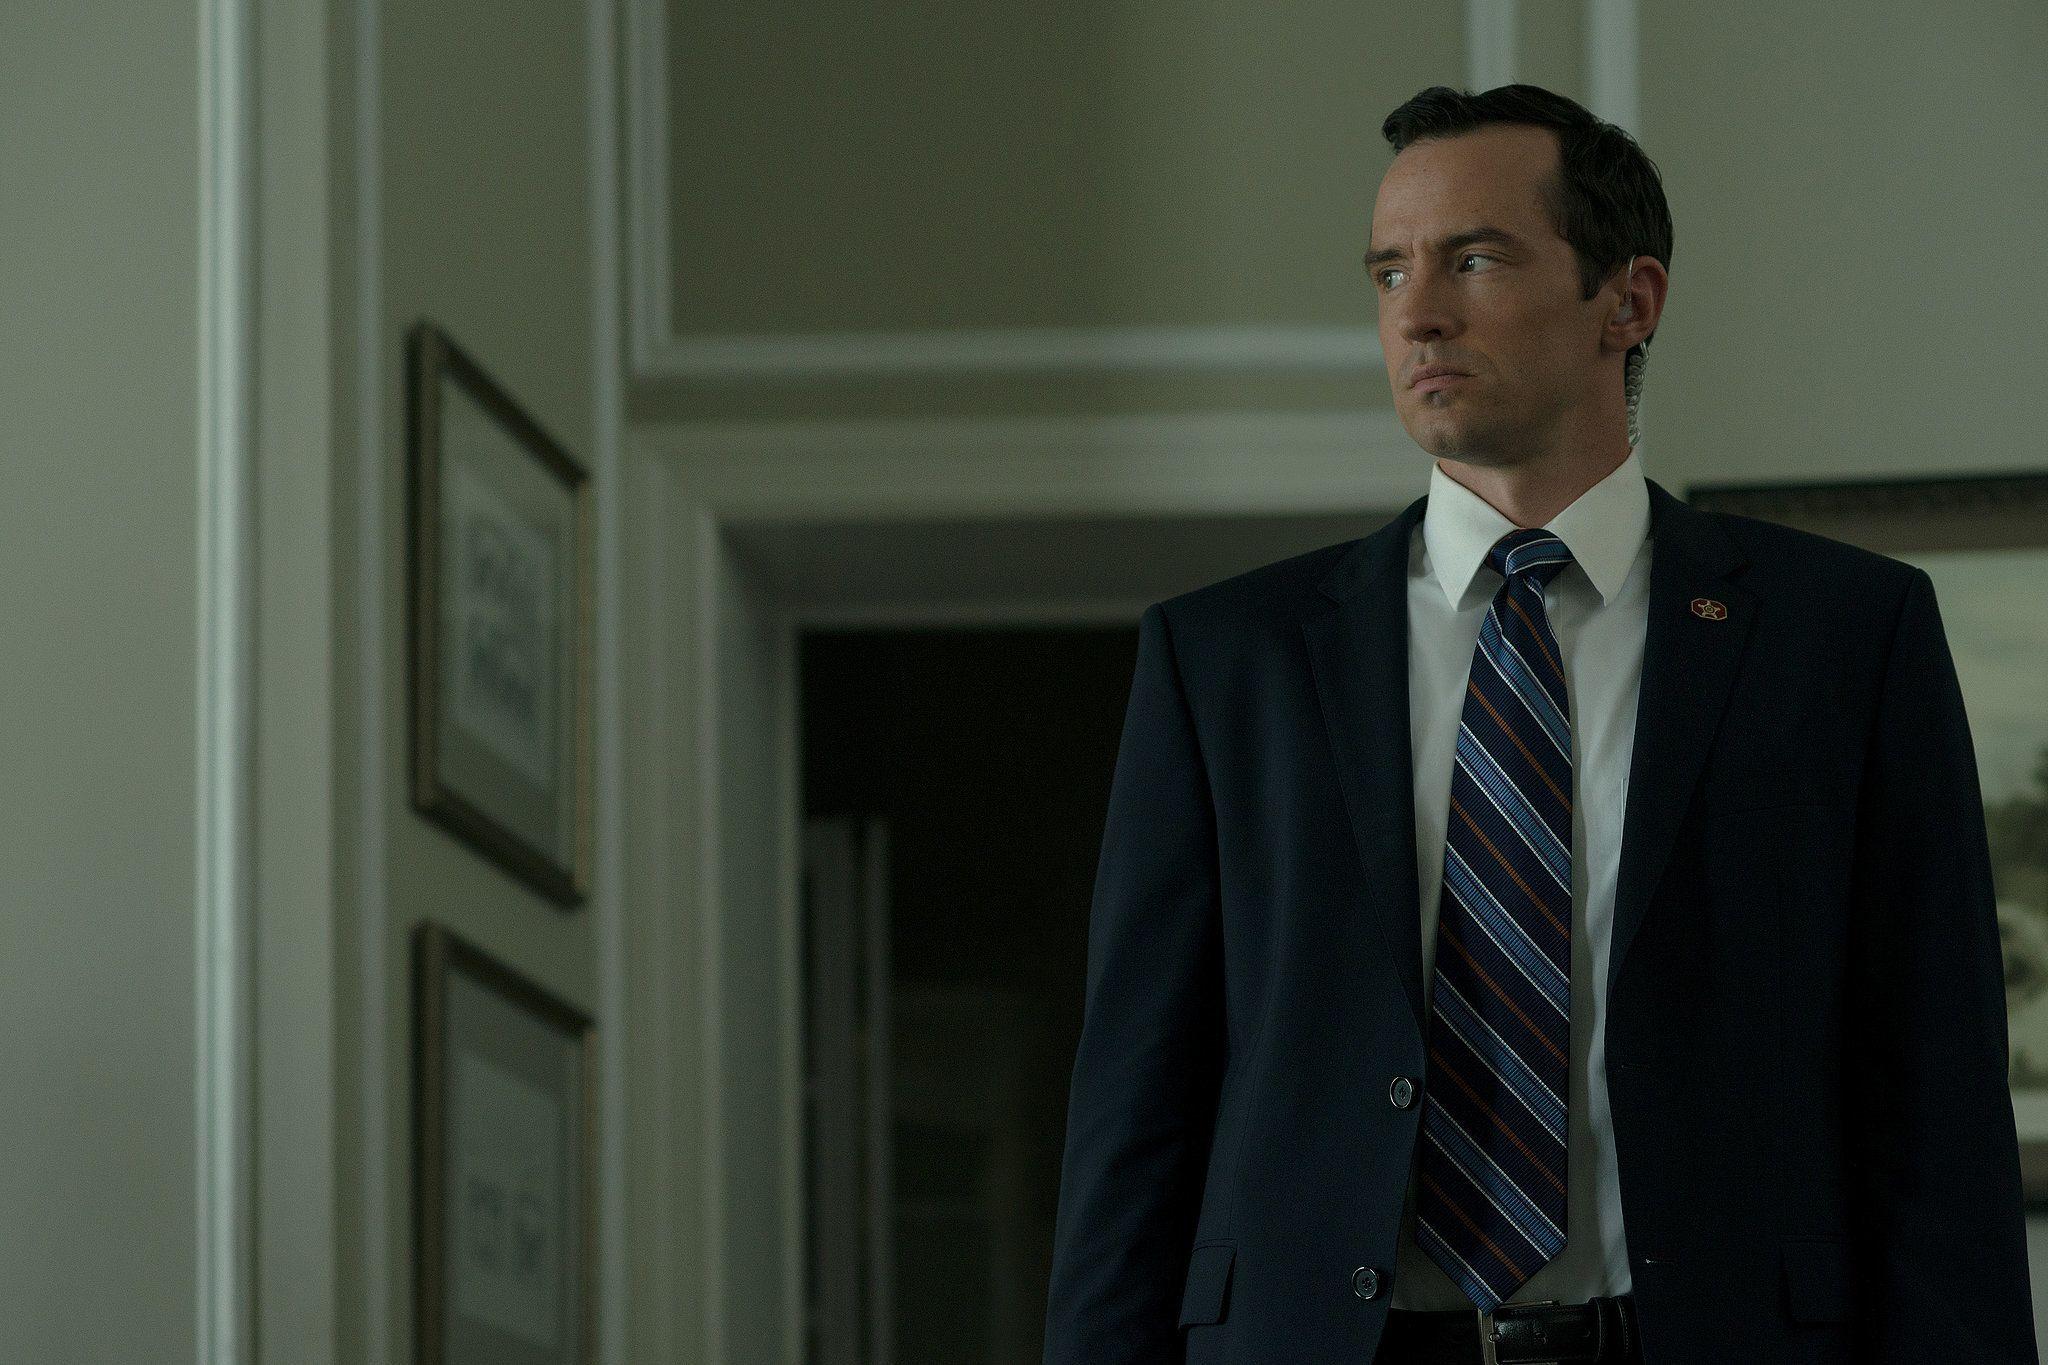 Edward Meechum (Nathan Darrow) On House Of Cards. Source: Netflix He Plays